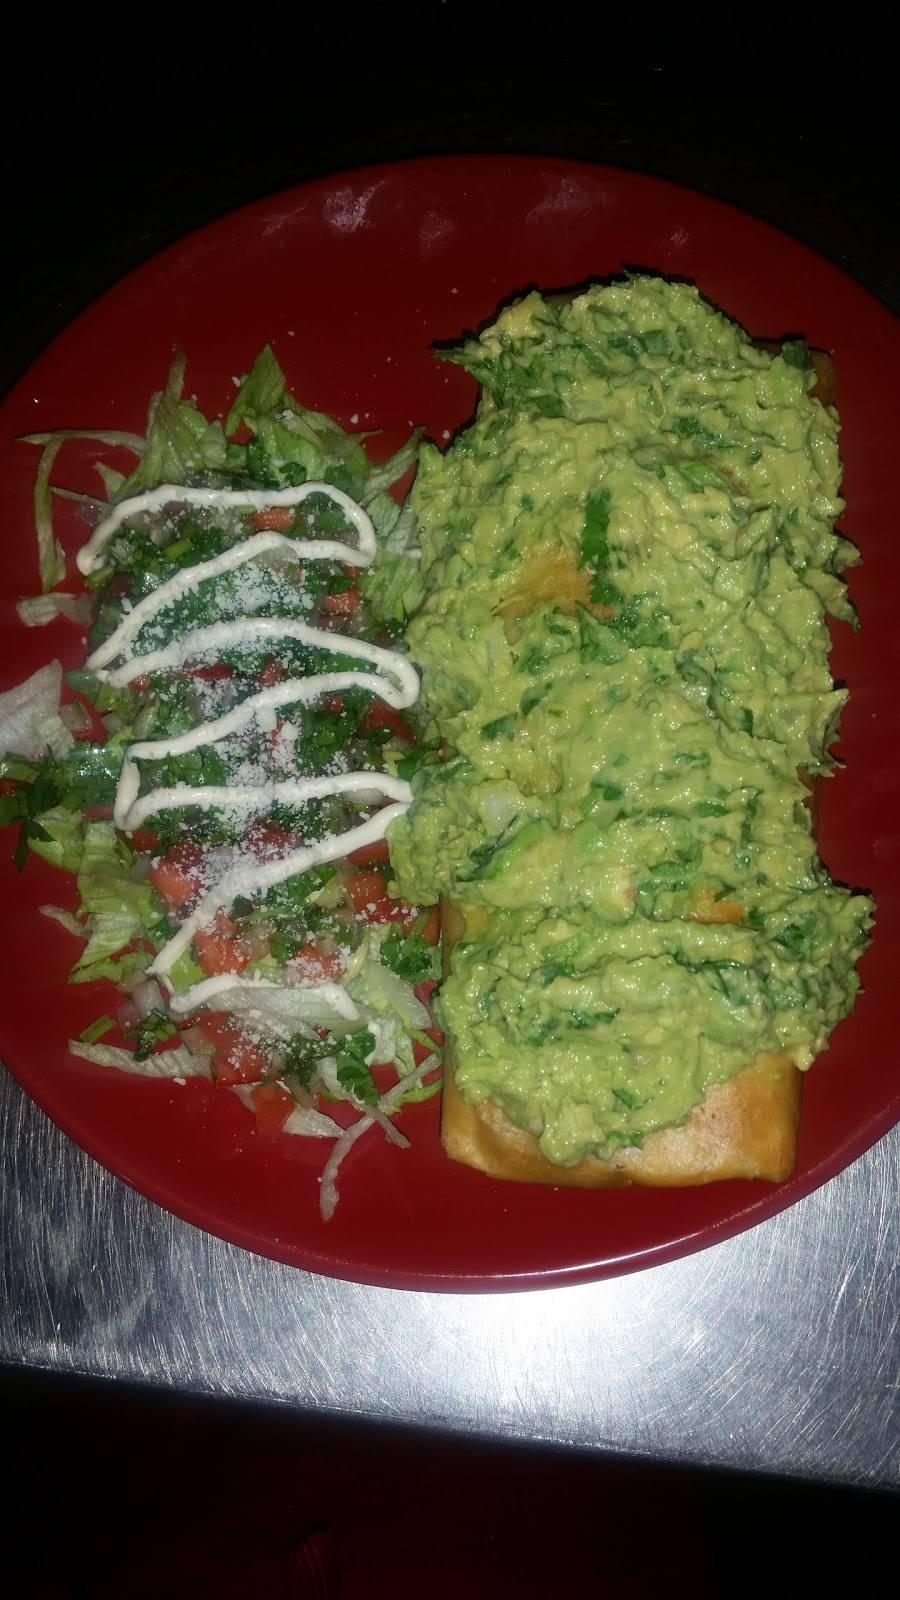 Espositos Italian & Mexican food | restaurant | 419 E Main St, Wrightstown, NJ 08562, USA | 6097235600 OR +1 609-723-5600